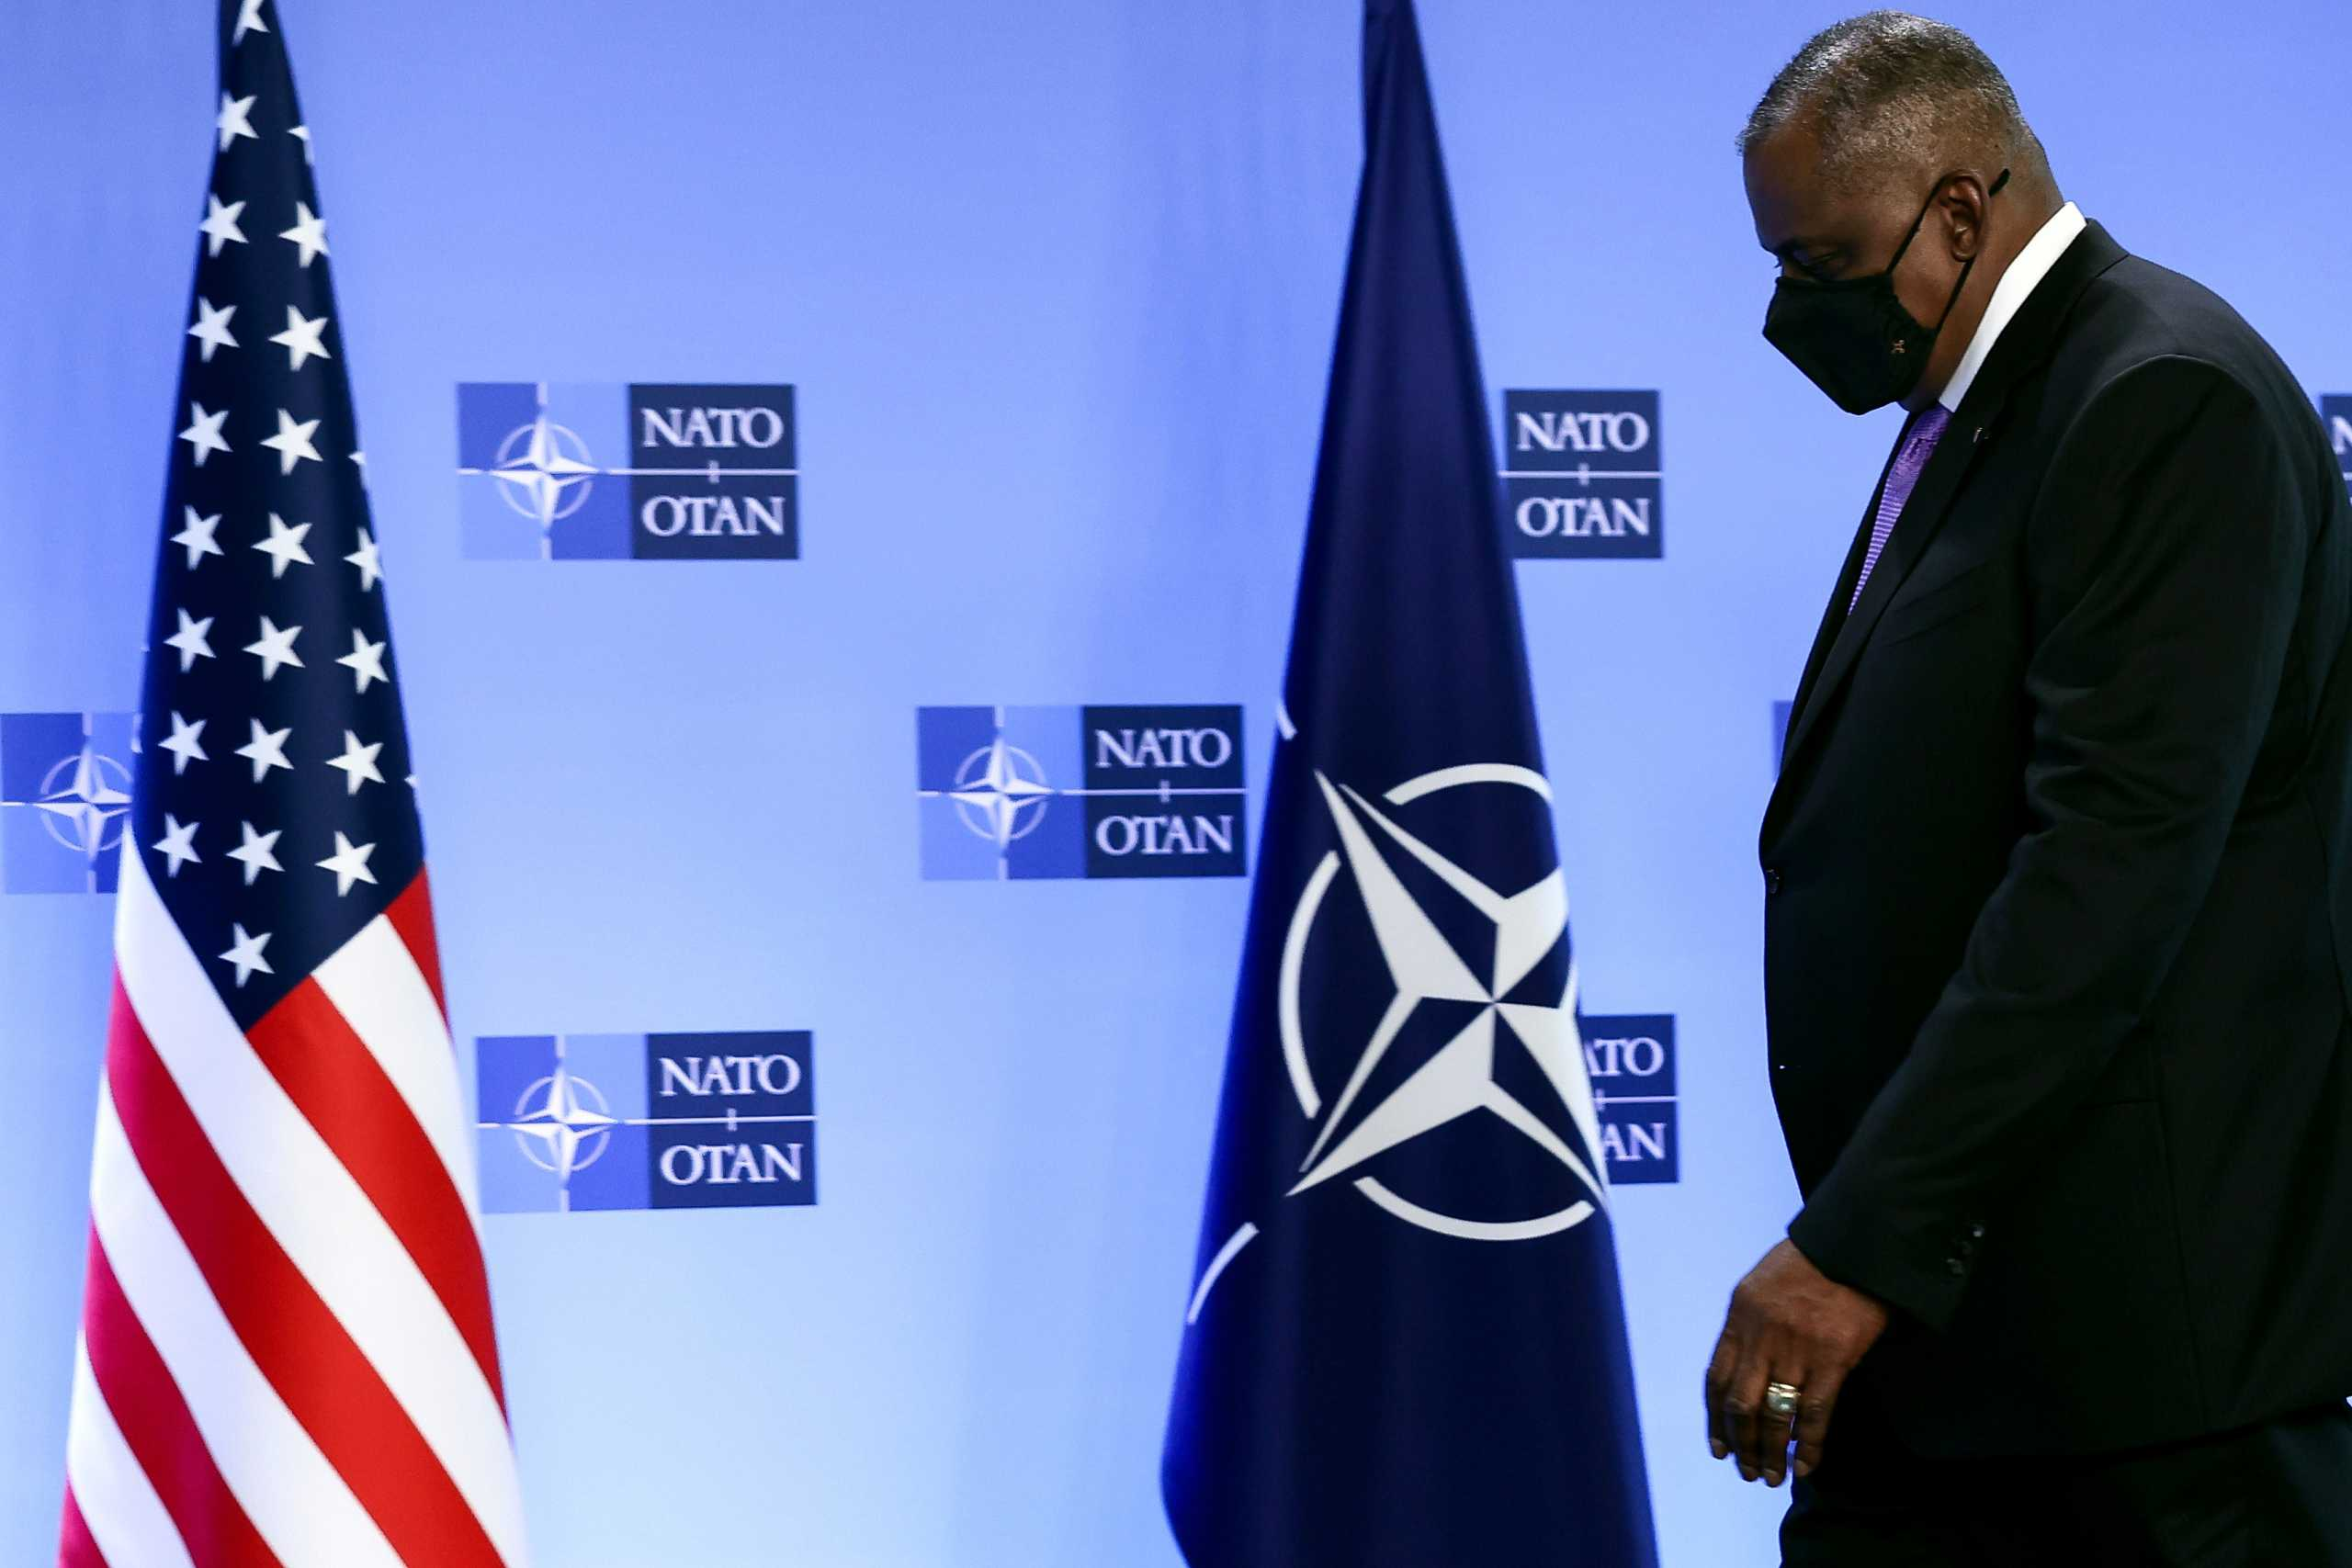 NATO: Οι επιθετικές ενέργειες της Ρωσίας ανησυχούν τον Αμερικανό Υπουργό Άμυνας Όστιν